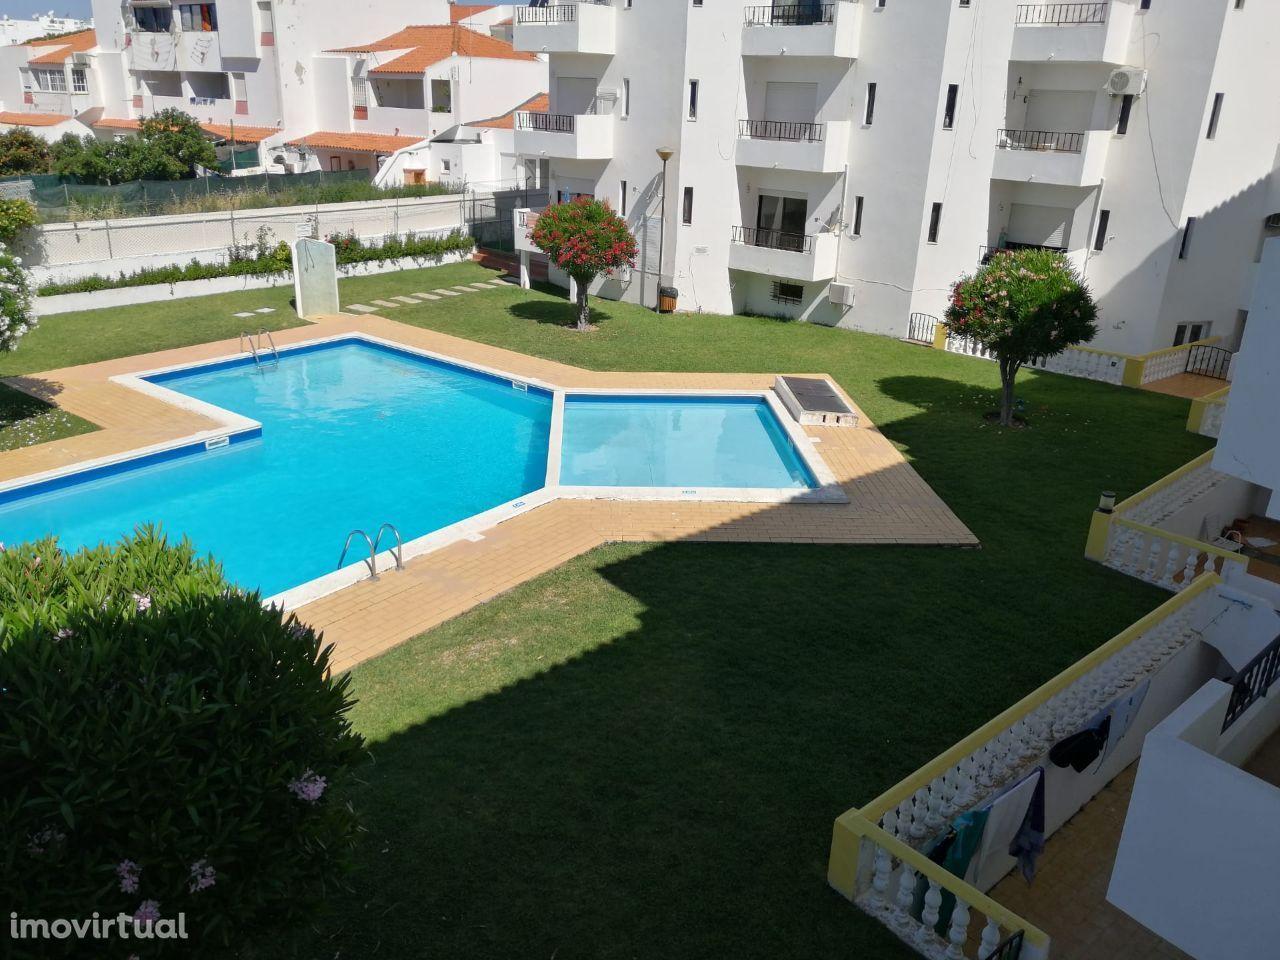 T2 condominio com piscina em Santa Eulalia Albufeira